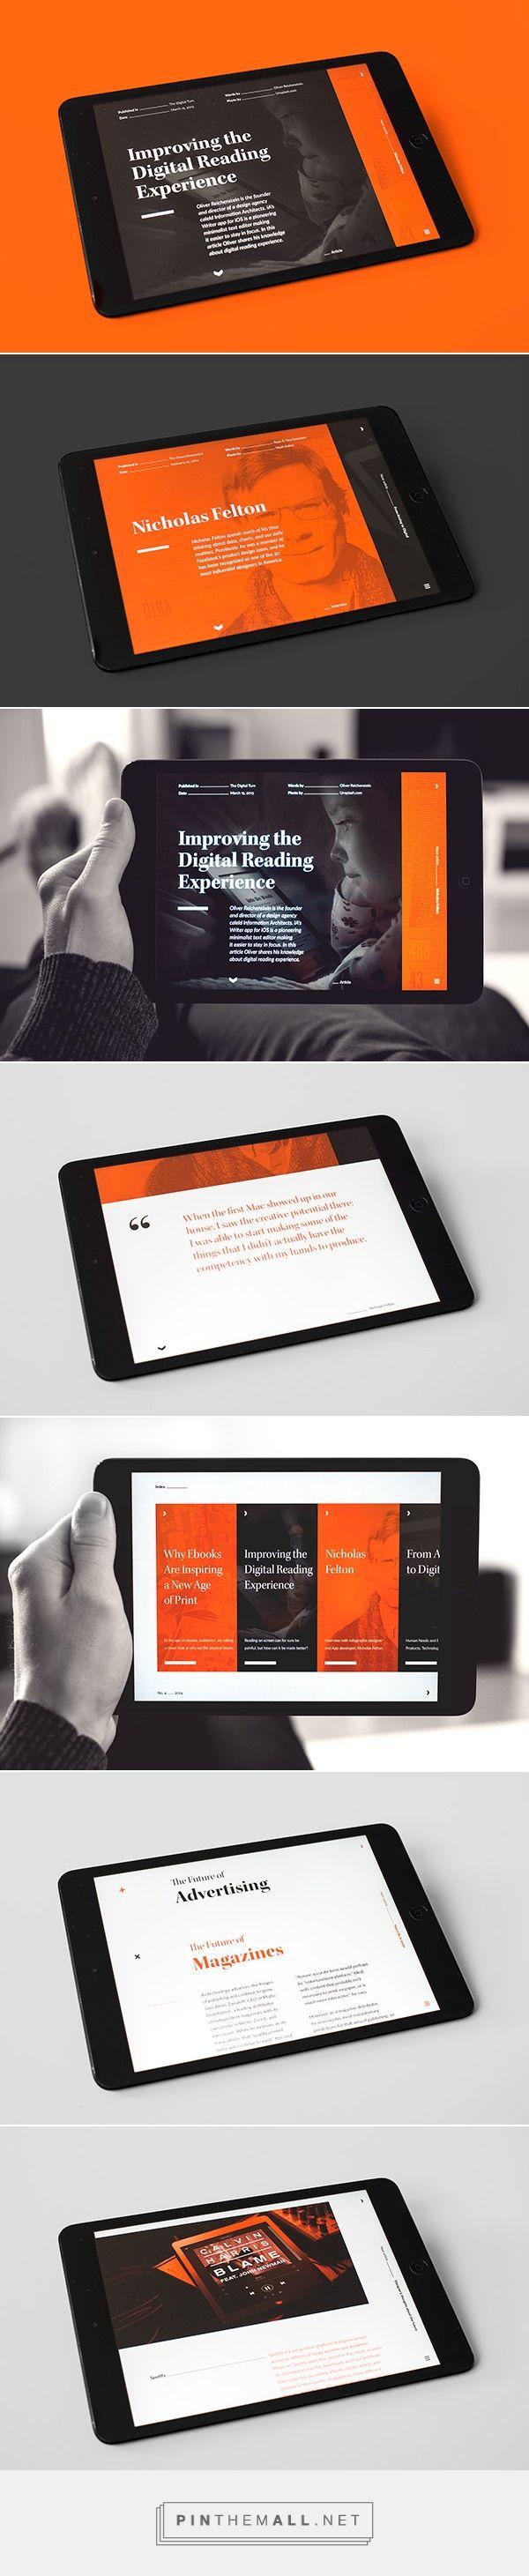 Verso – Digital Magazine | Abduzeedo Design Inspiration - created via http://pinthemall.net